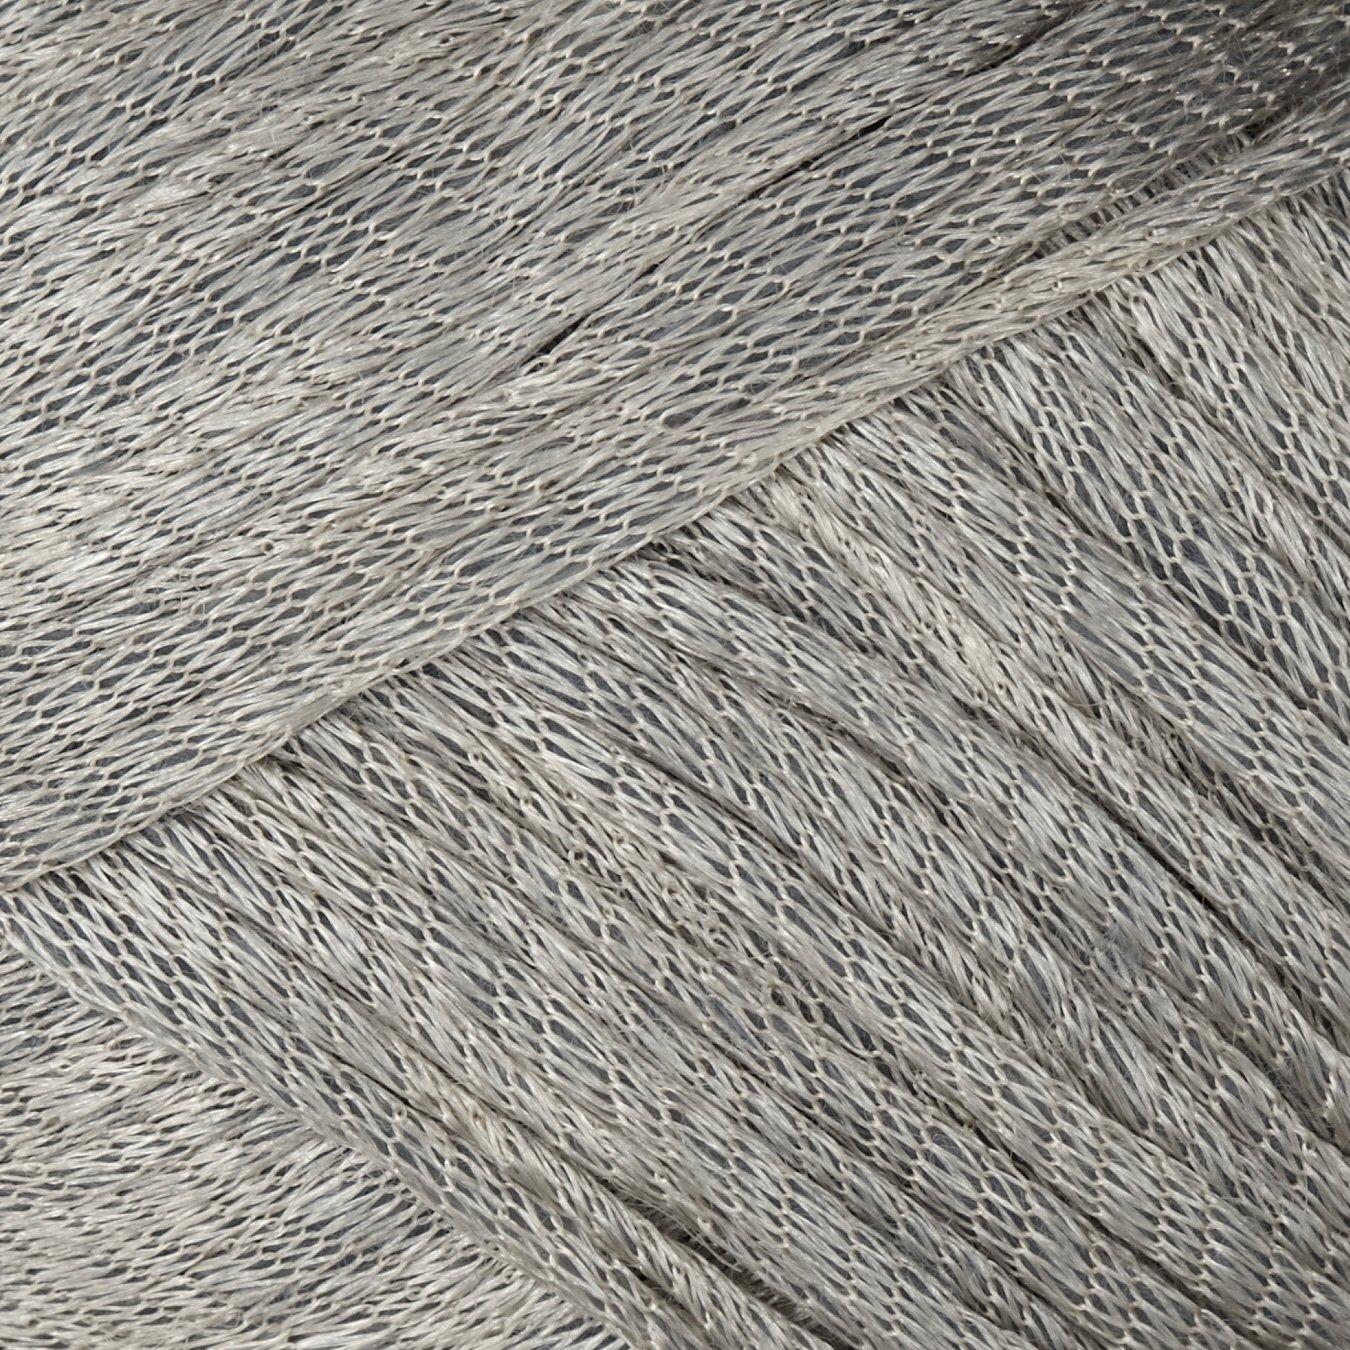 Amazon.com: Patons Metallic Yarn (95042) Platinum